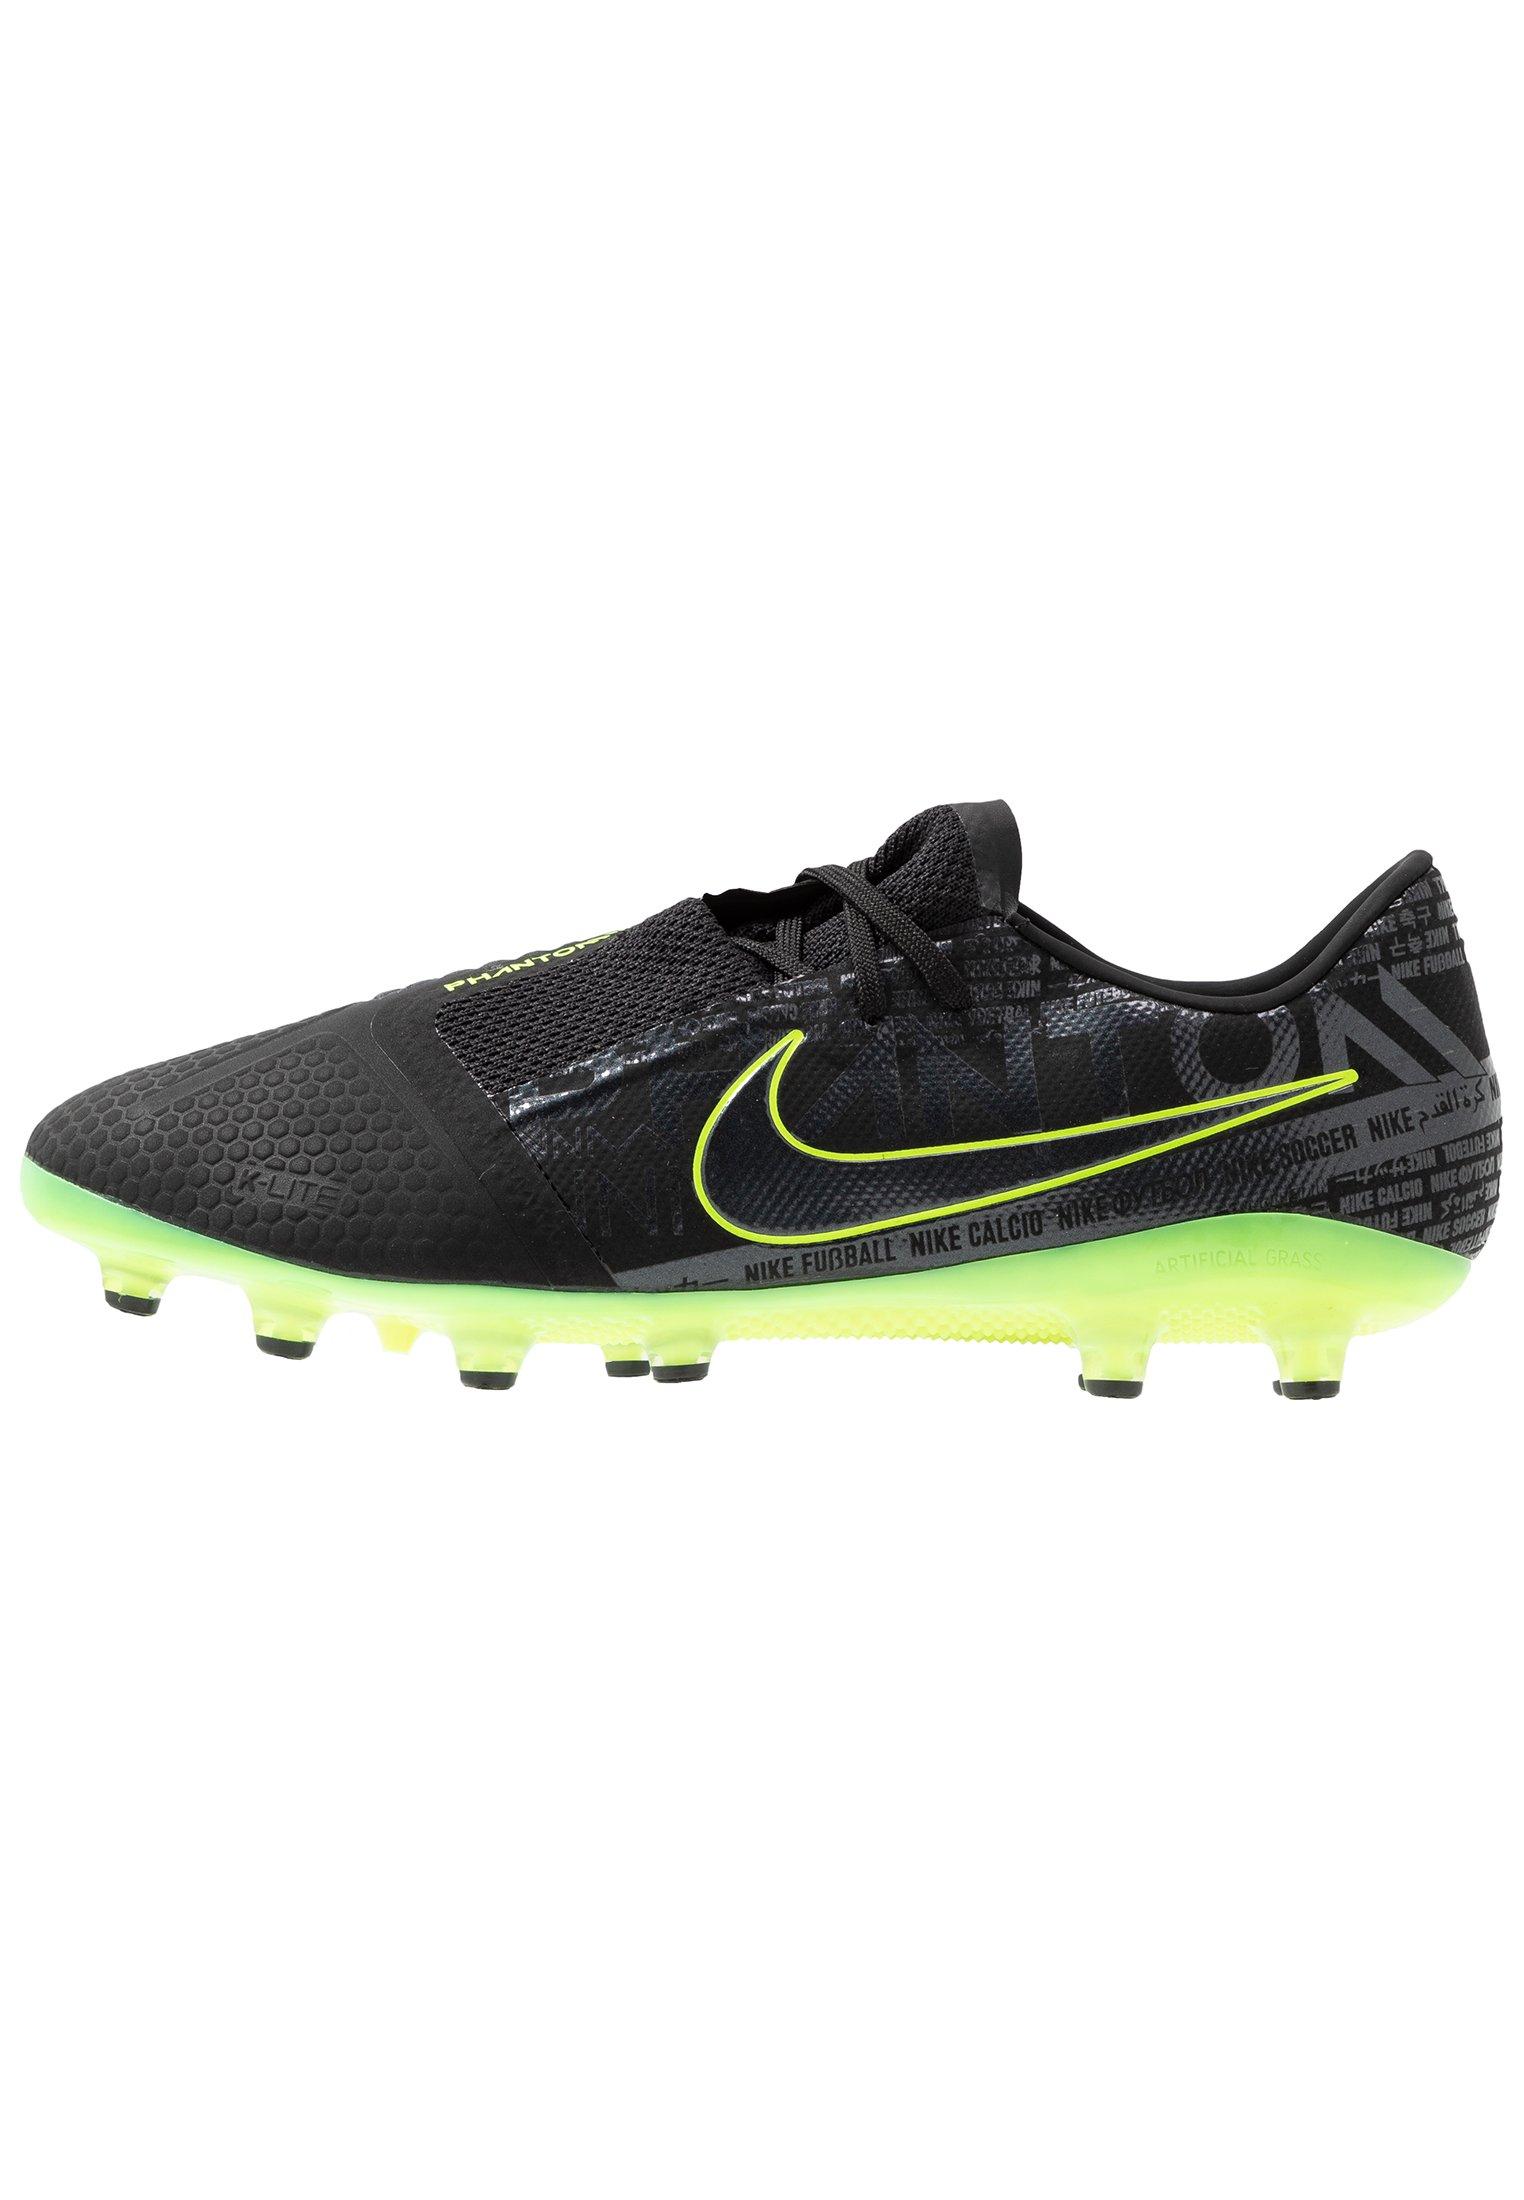 PHANTOM AG PRO Chaussures de foot à crampons blackvolt